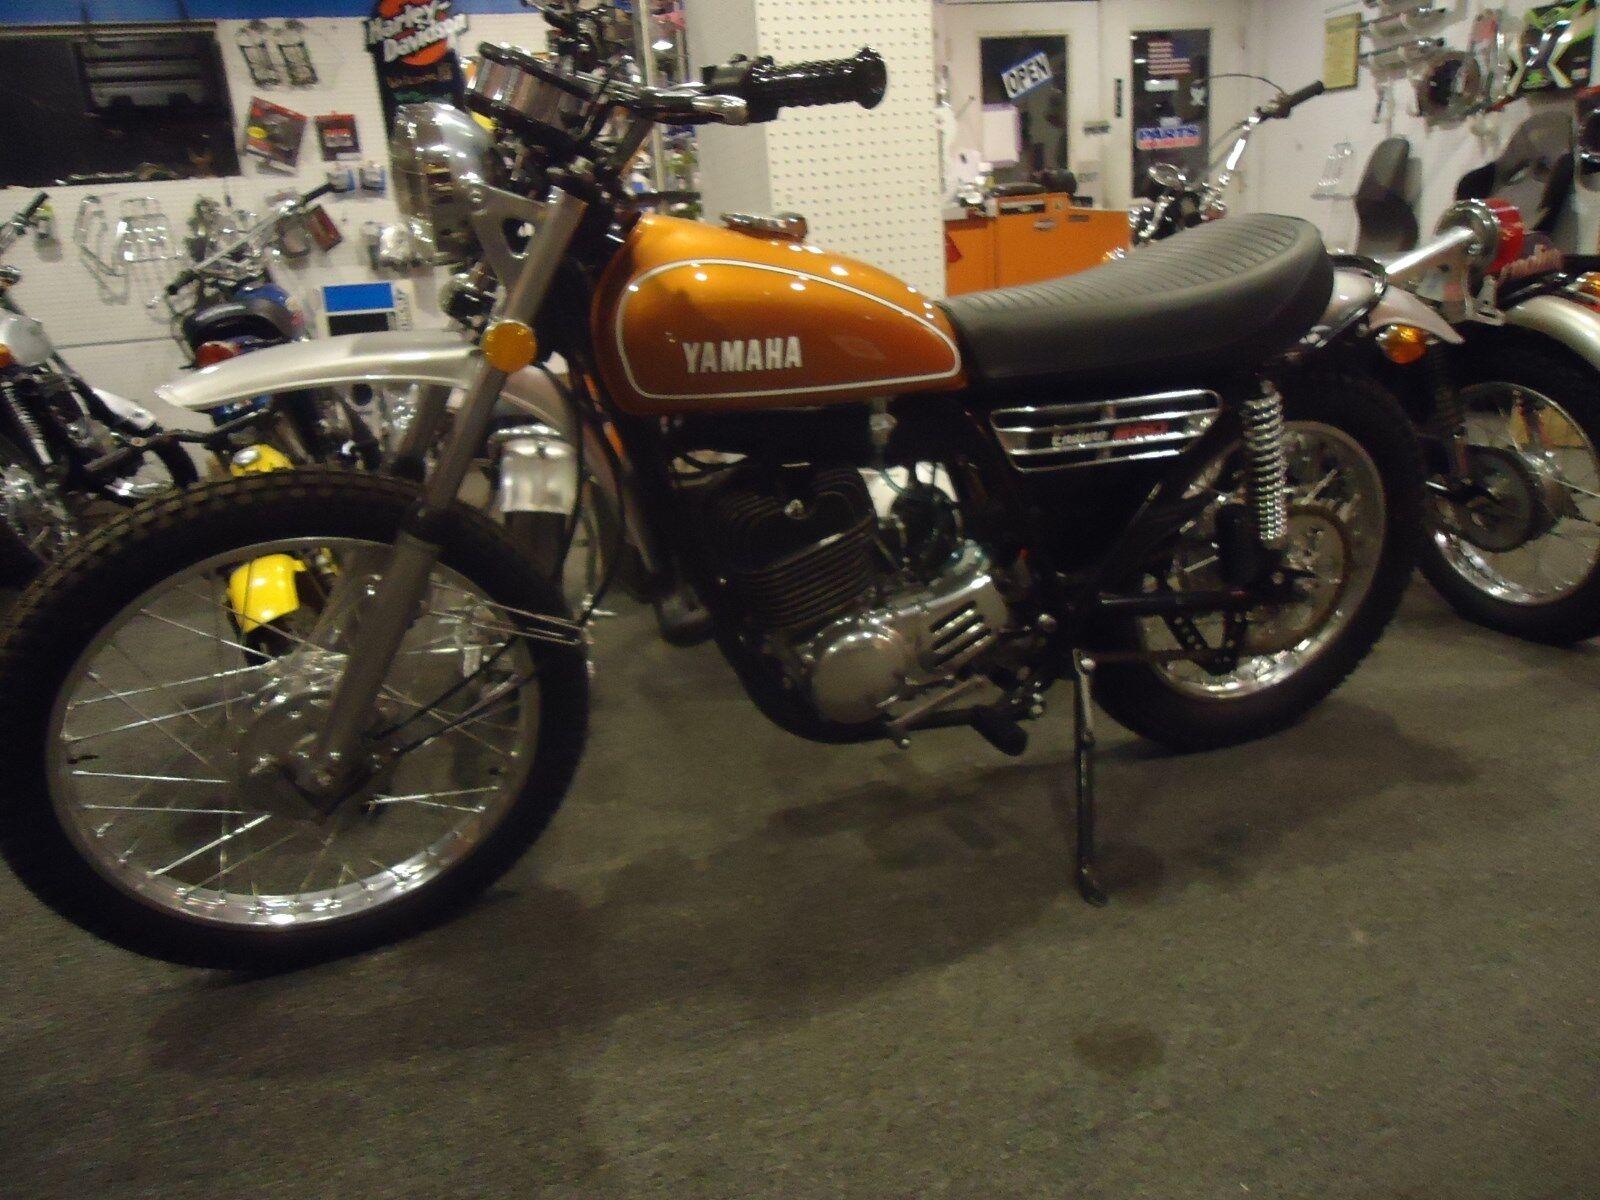 1974 Yamaha DT250  1974 Yamaha DT250 Enduro , Showroom or better , BEAUTIFUL RESTORATION !